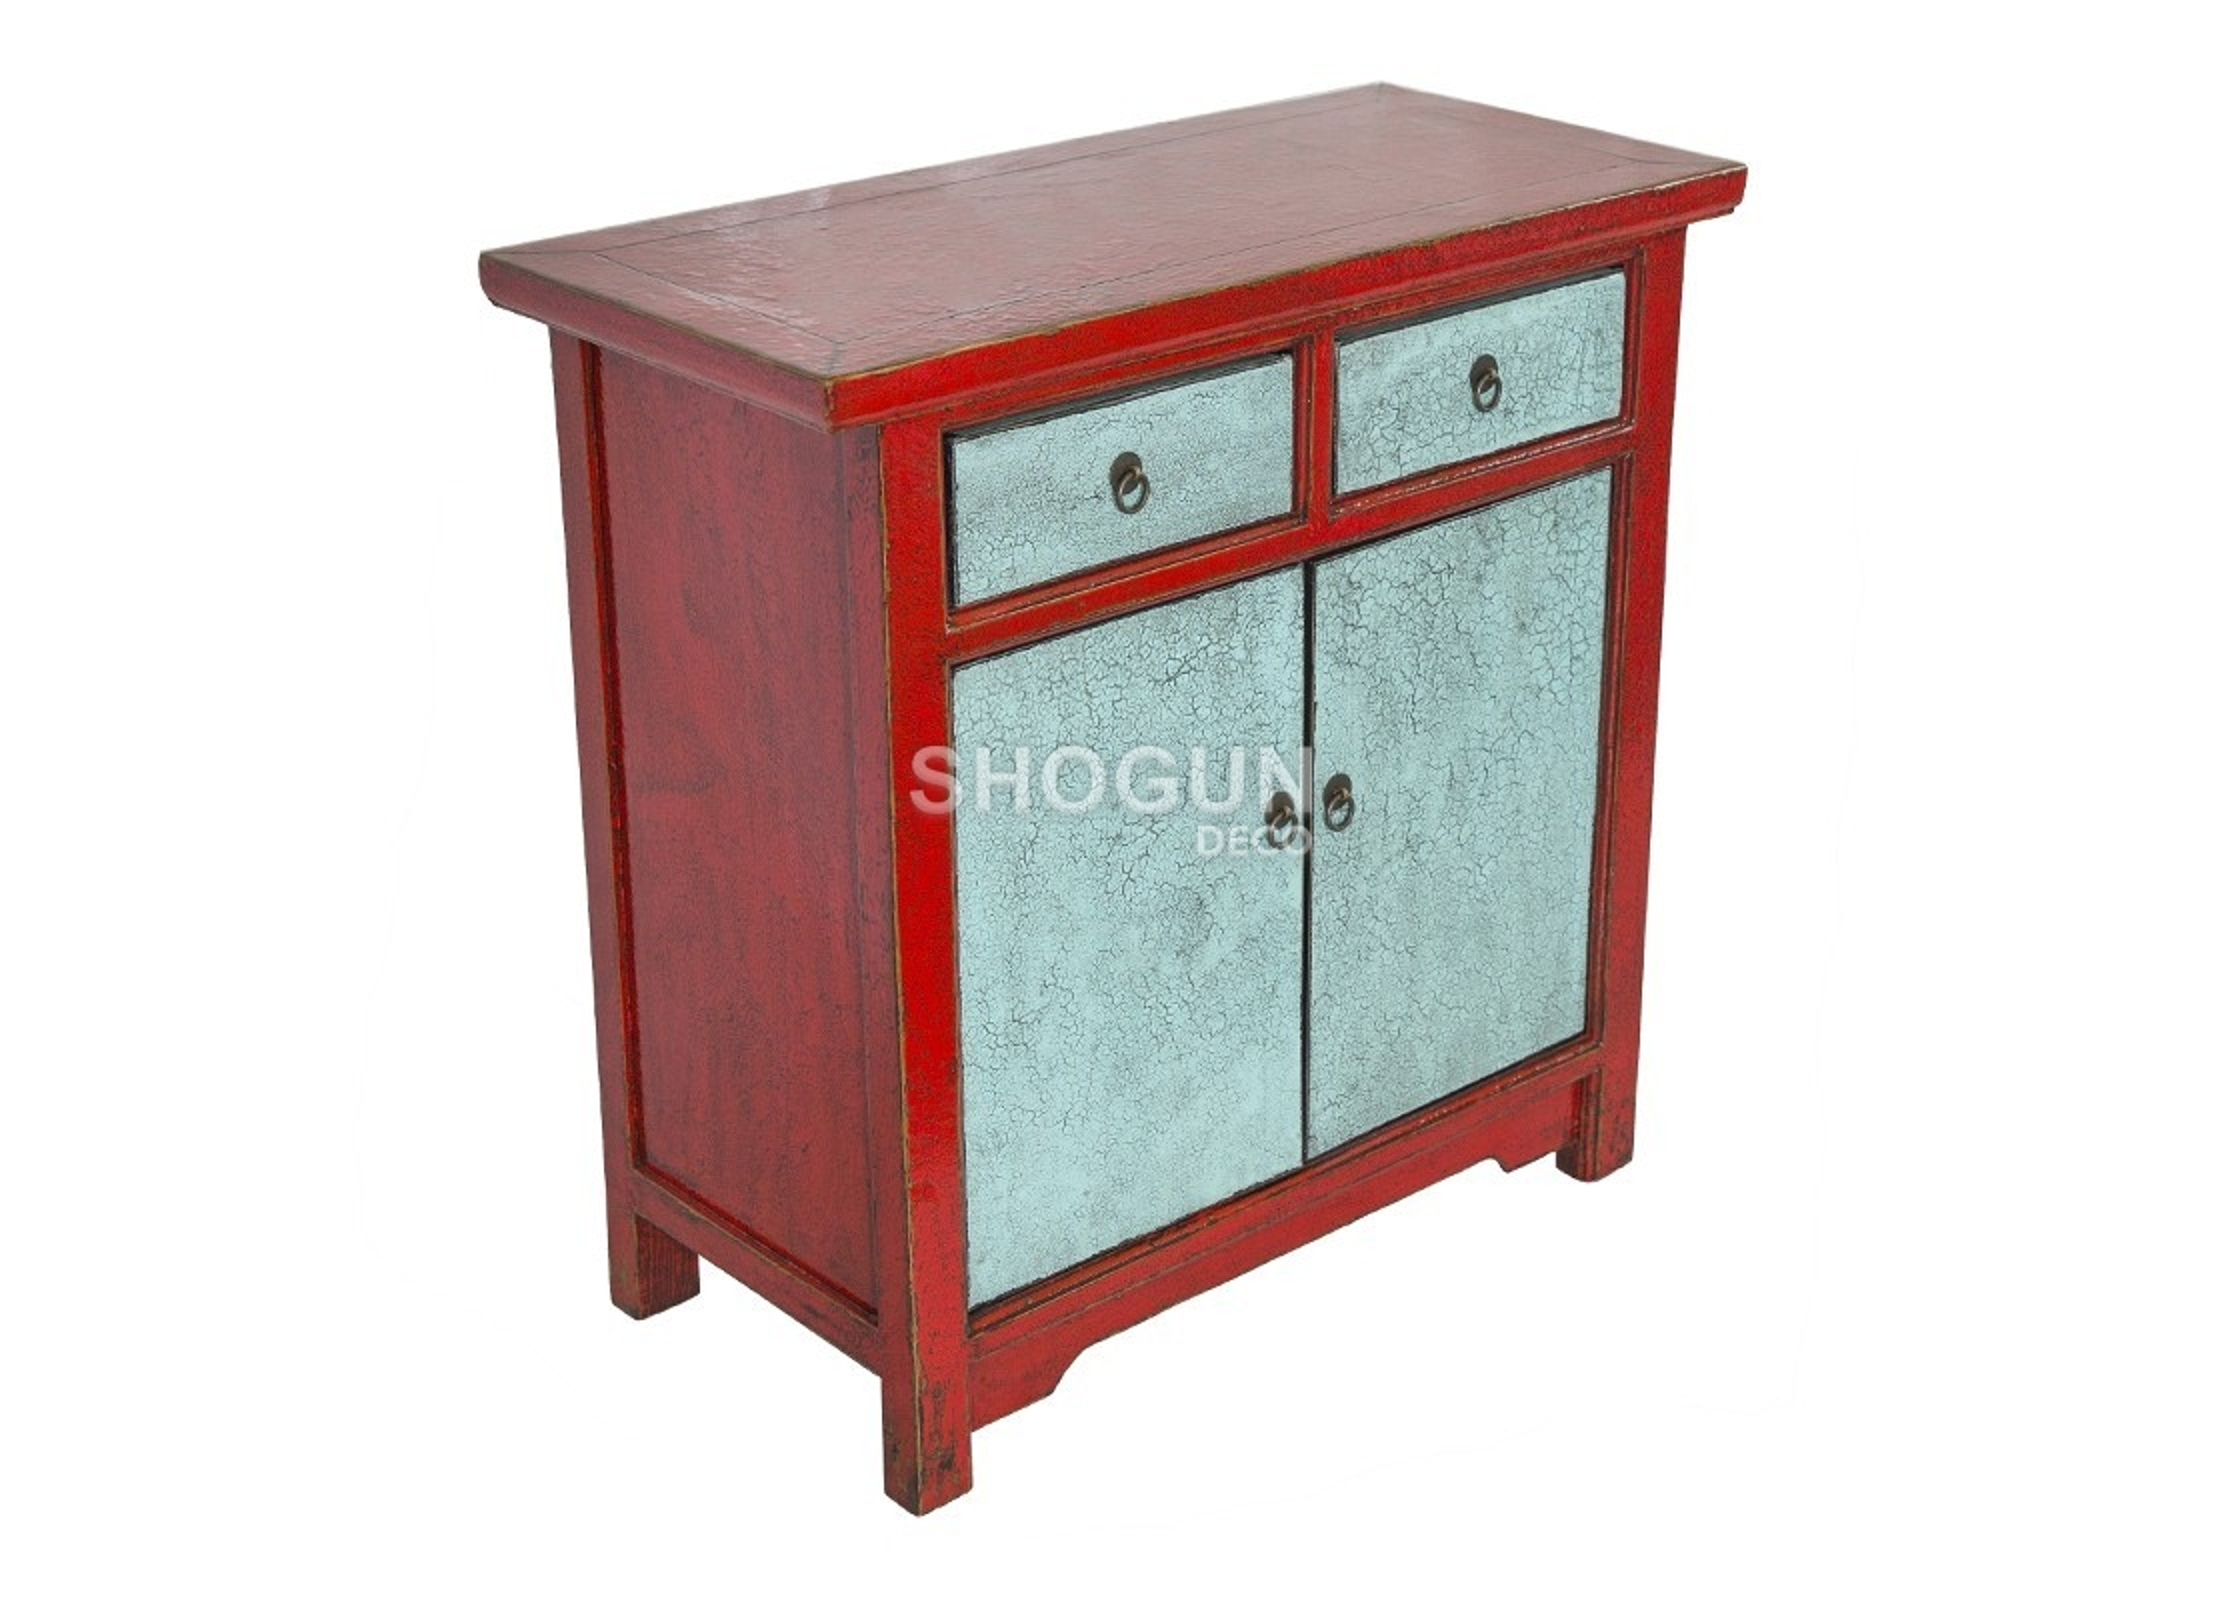 buffet en bois massif avec finition laqu e bleu rouge. Black Bedroom Furniture Sets. Home Design Ideas